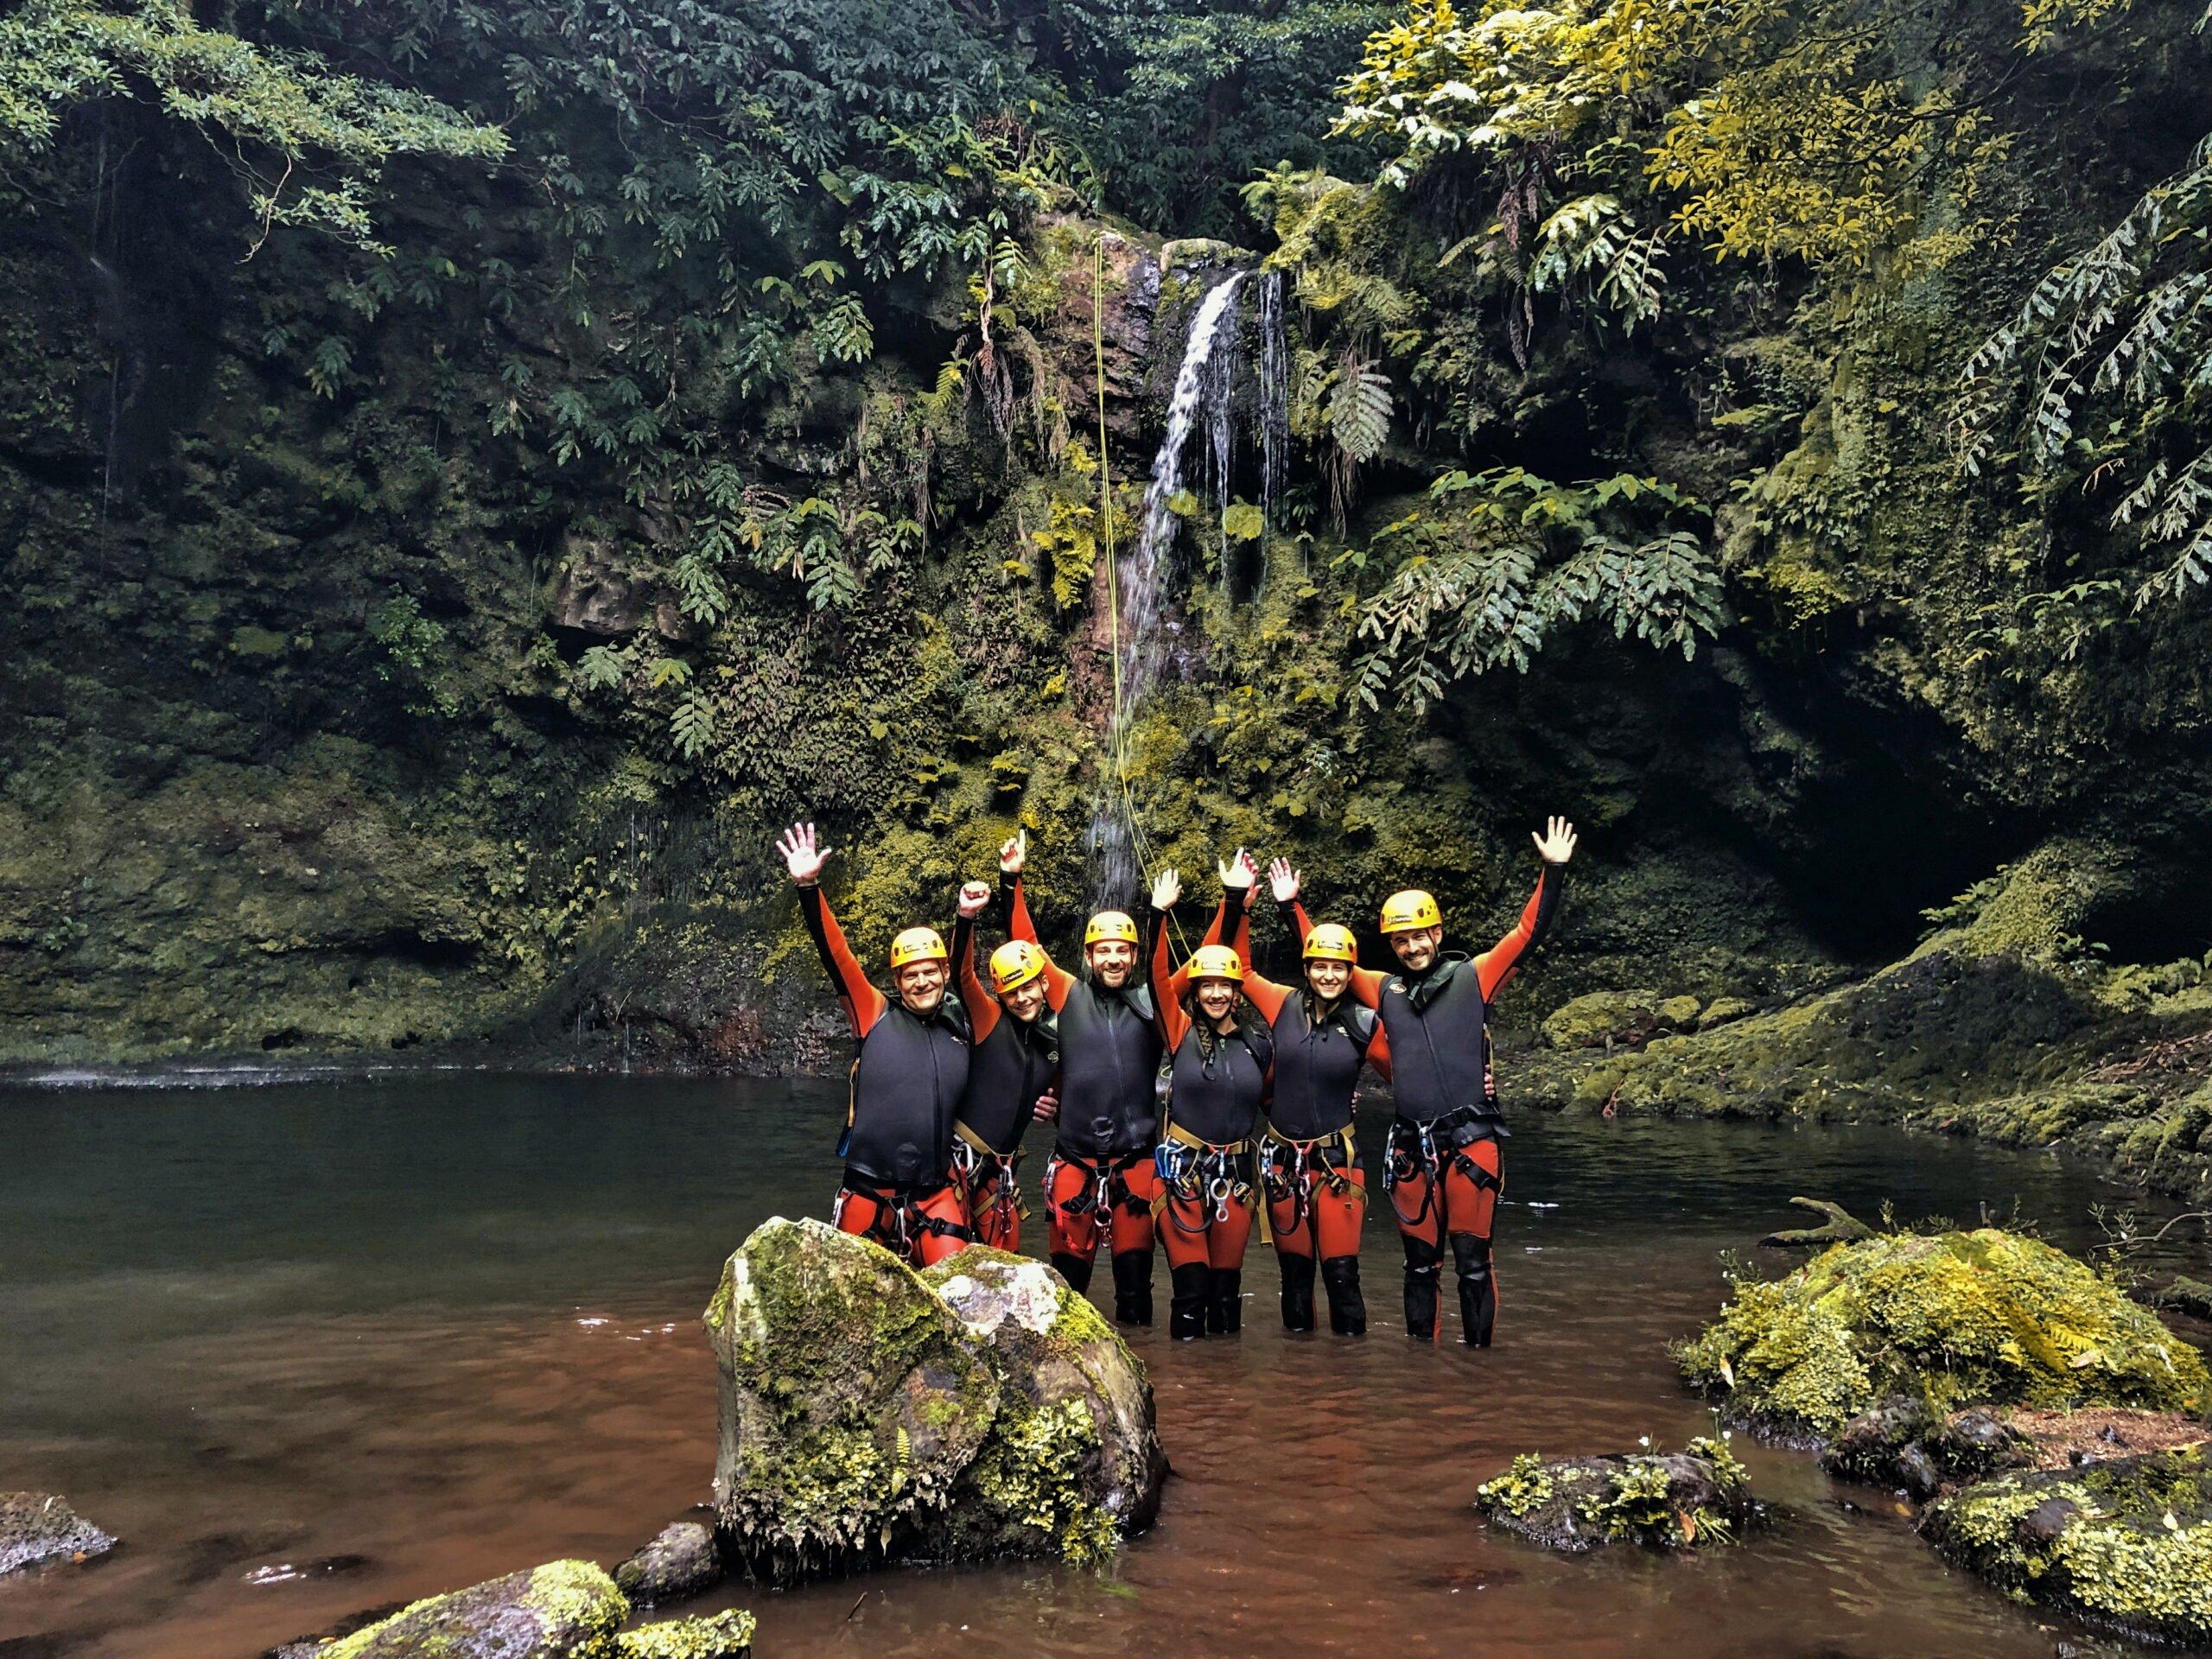 Ribeira Da Salga Canyoning Tour From Ponta Delgada_108_4